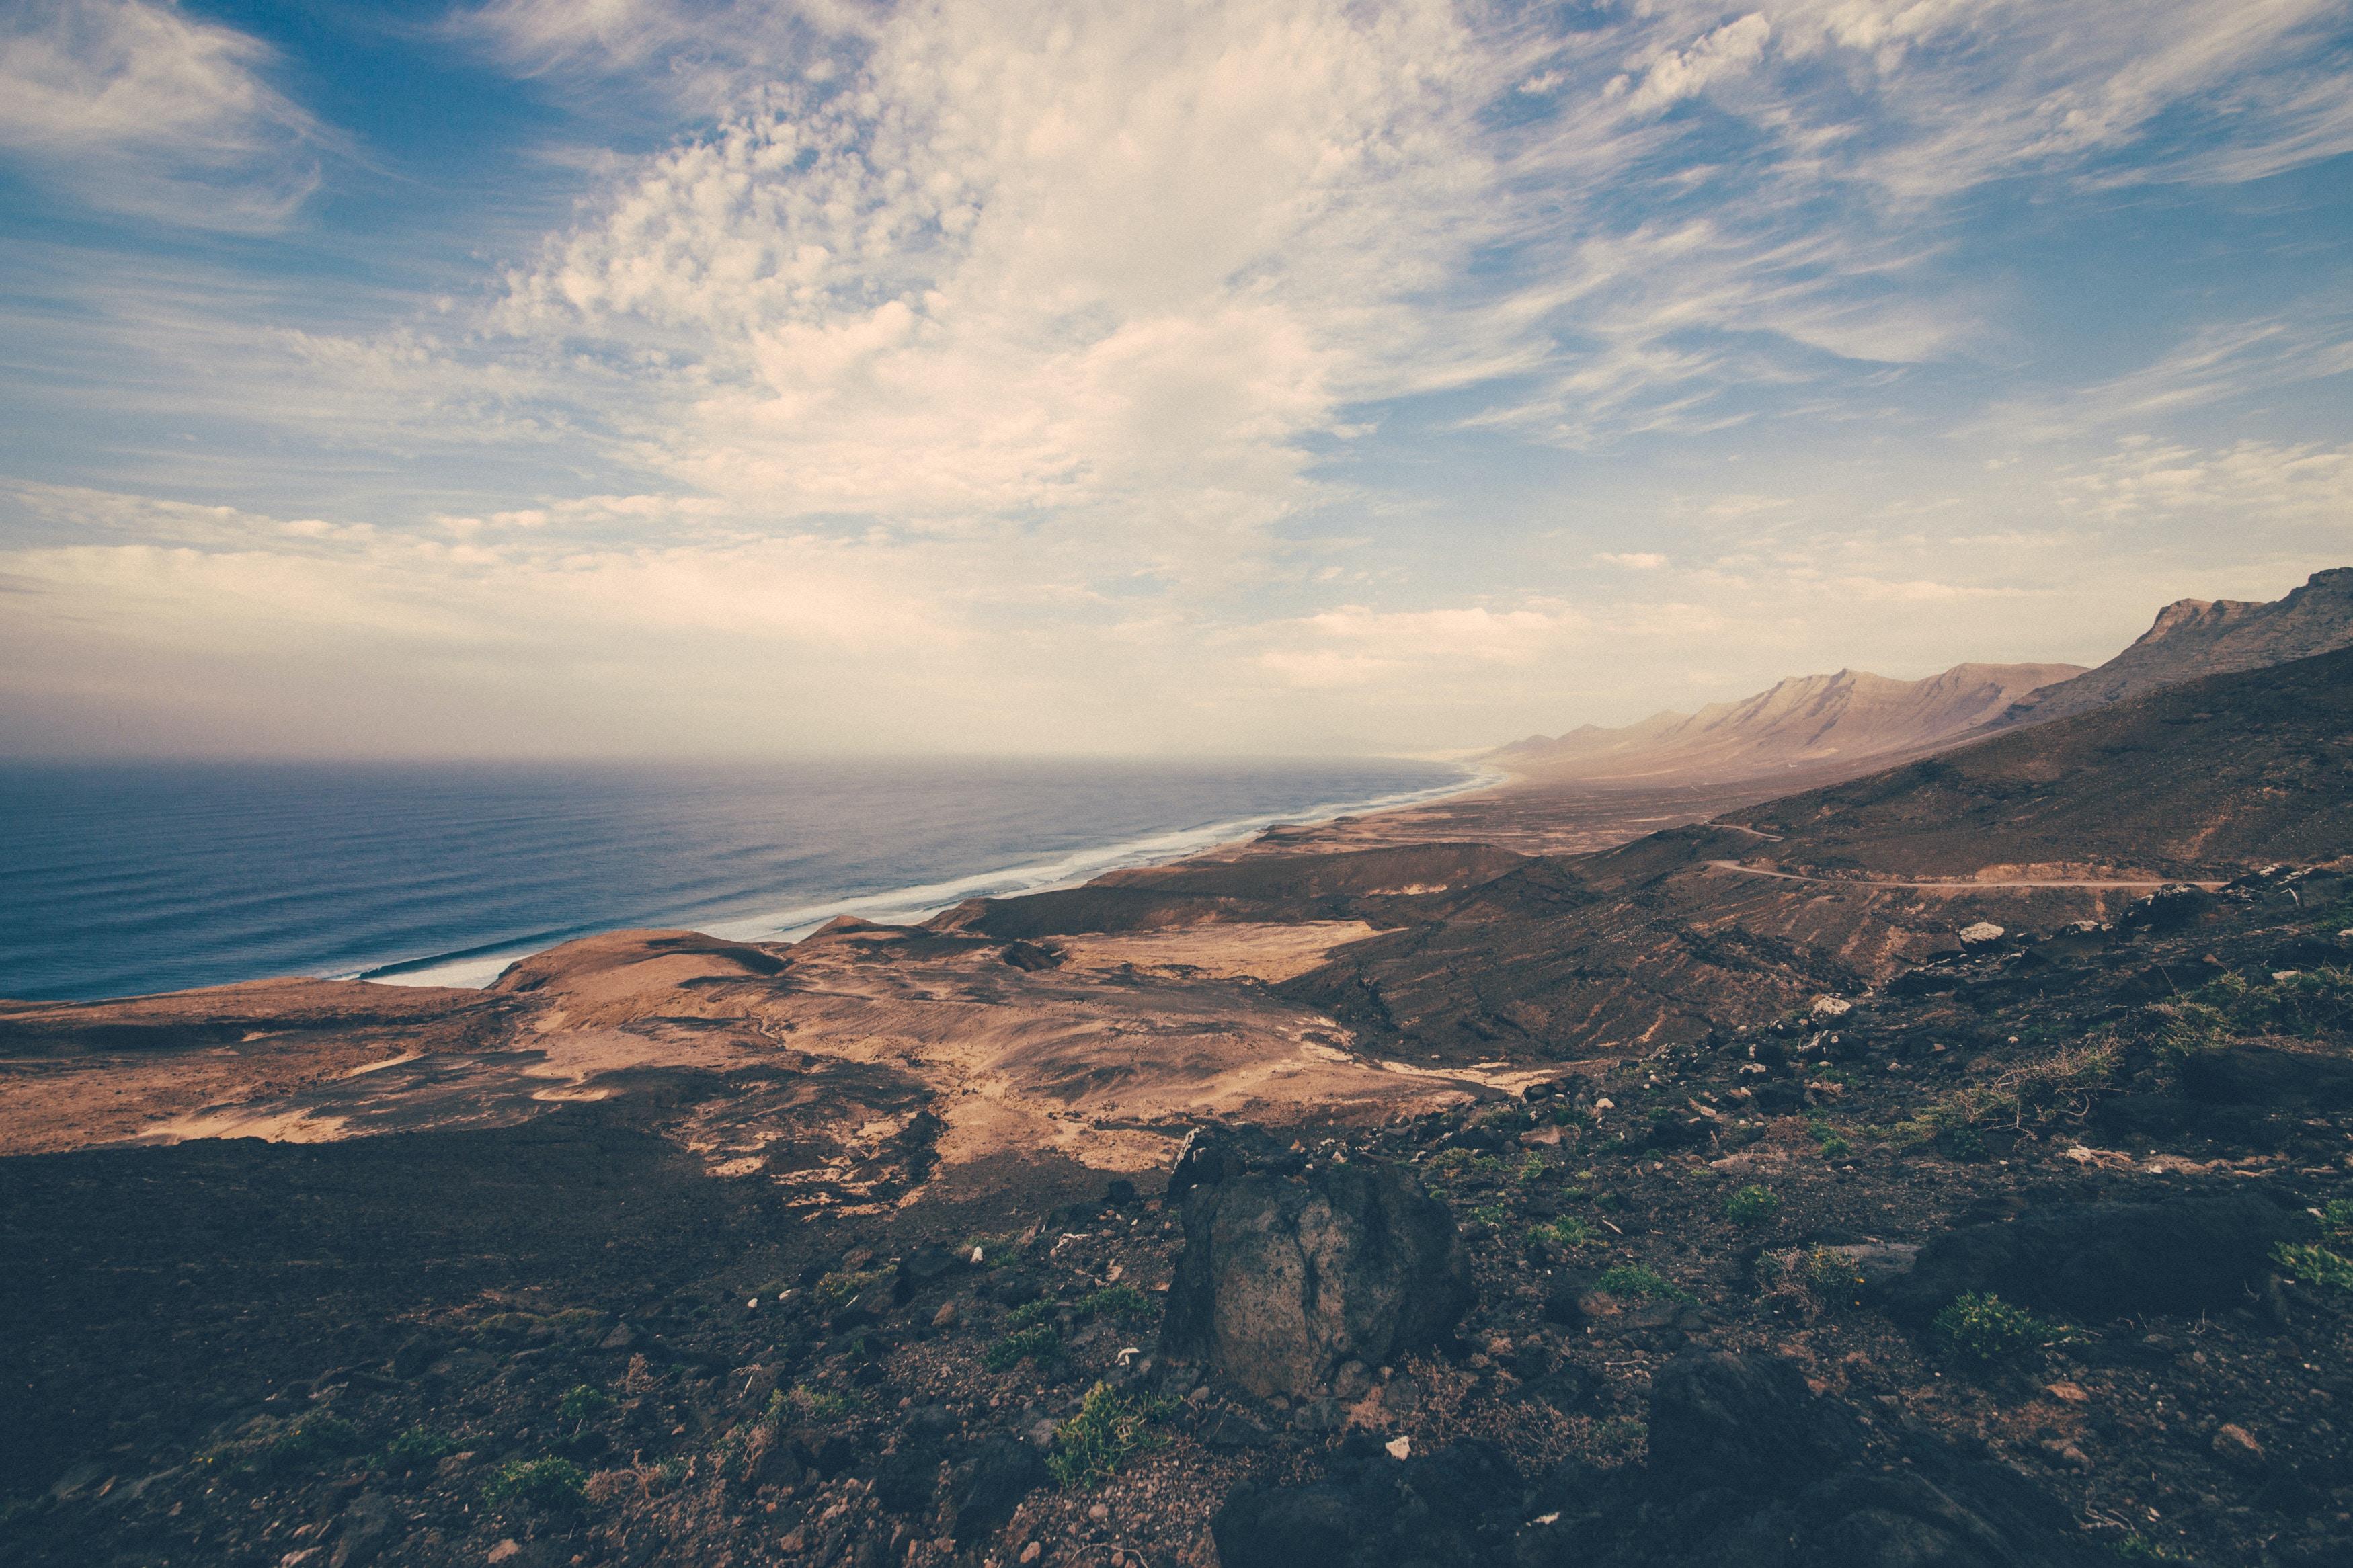 Barren coastline by the mountain range at Cofete